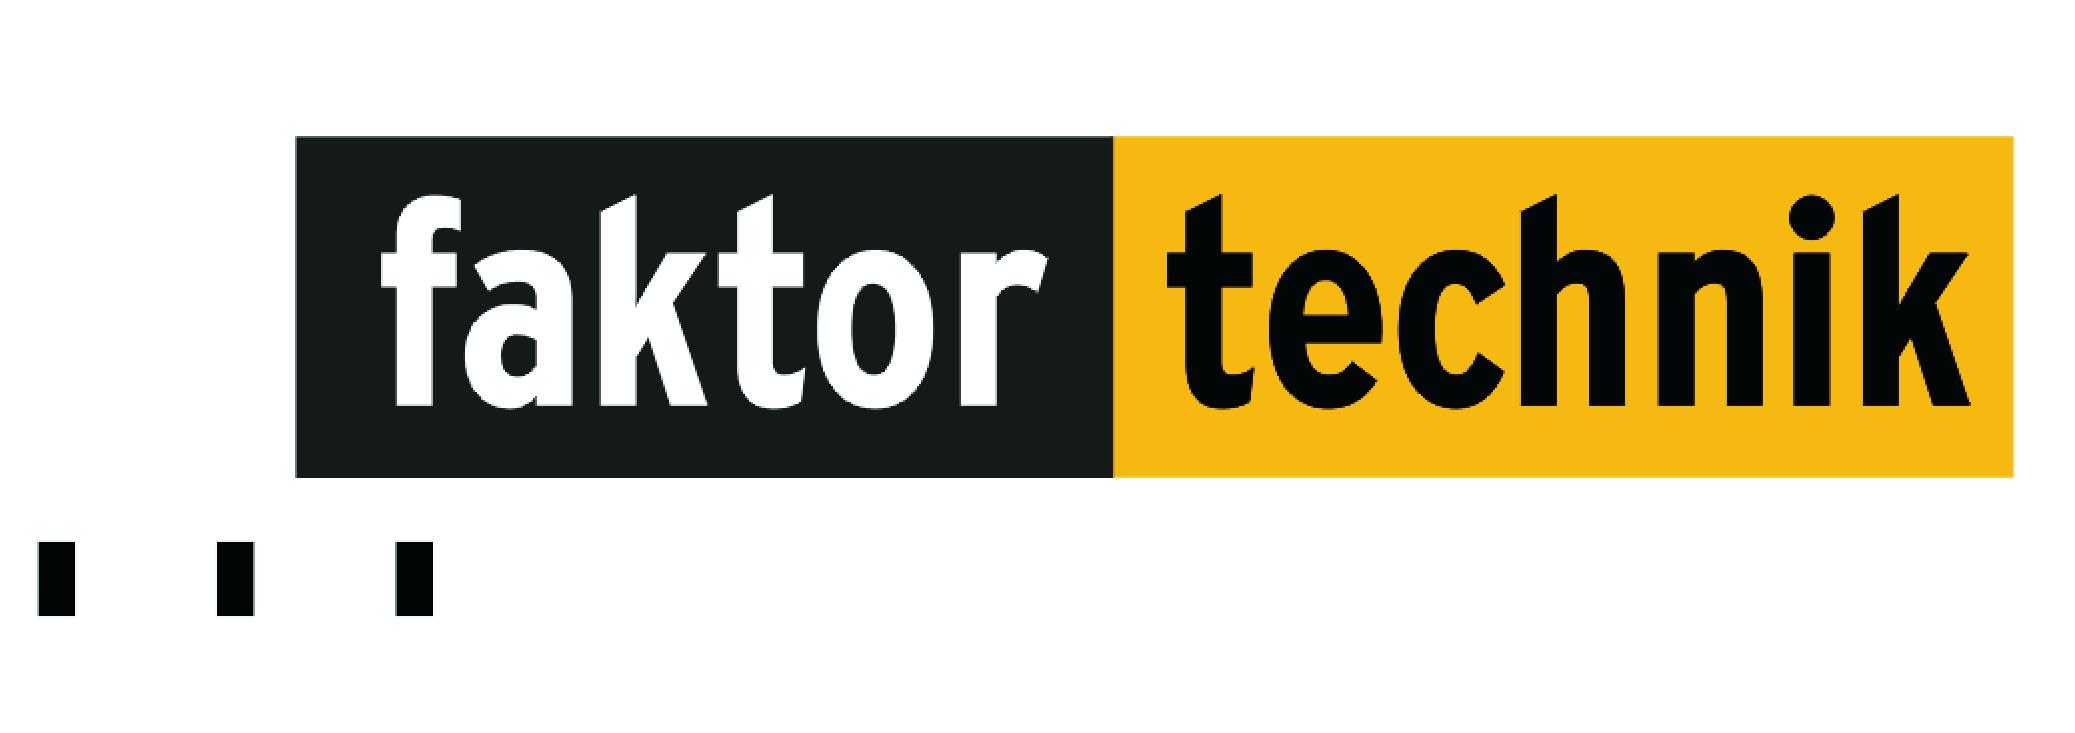 faktor technik